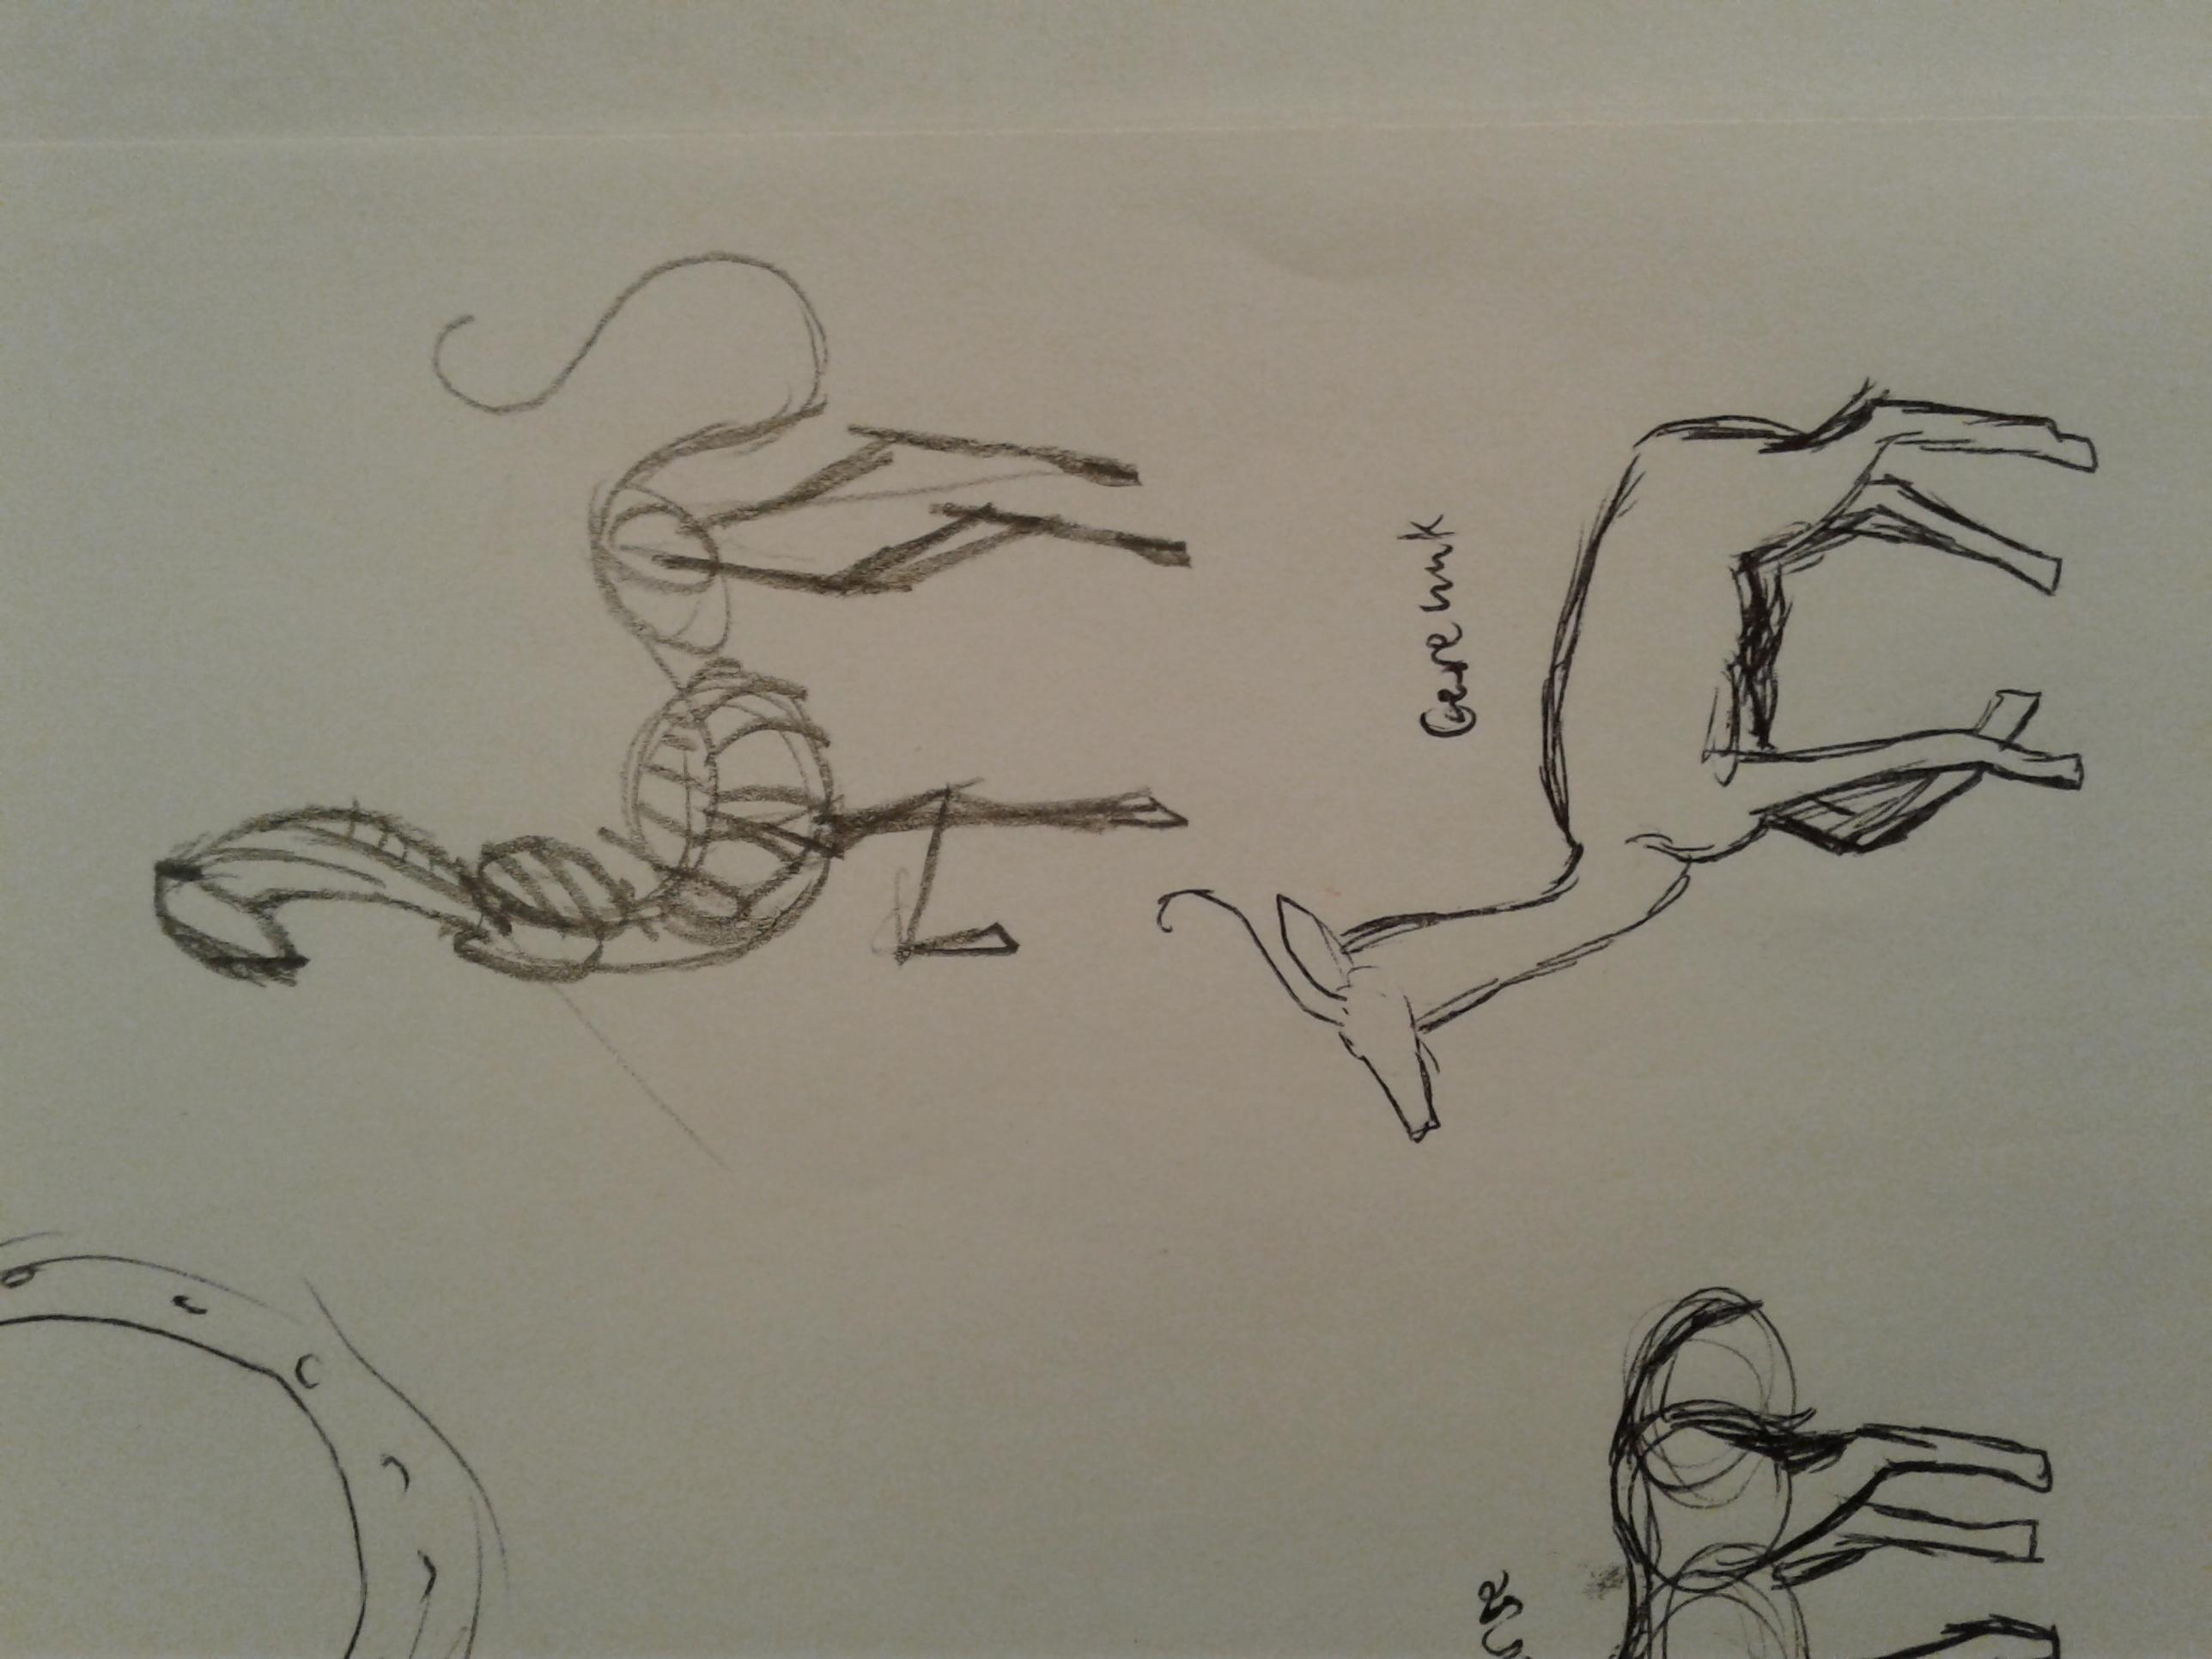 Andalite sketch by Jade